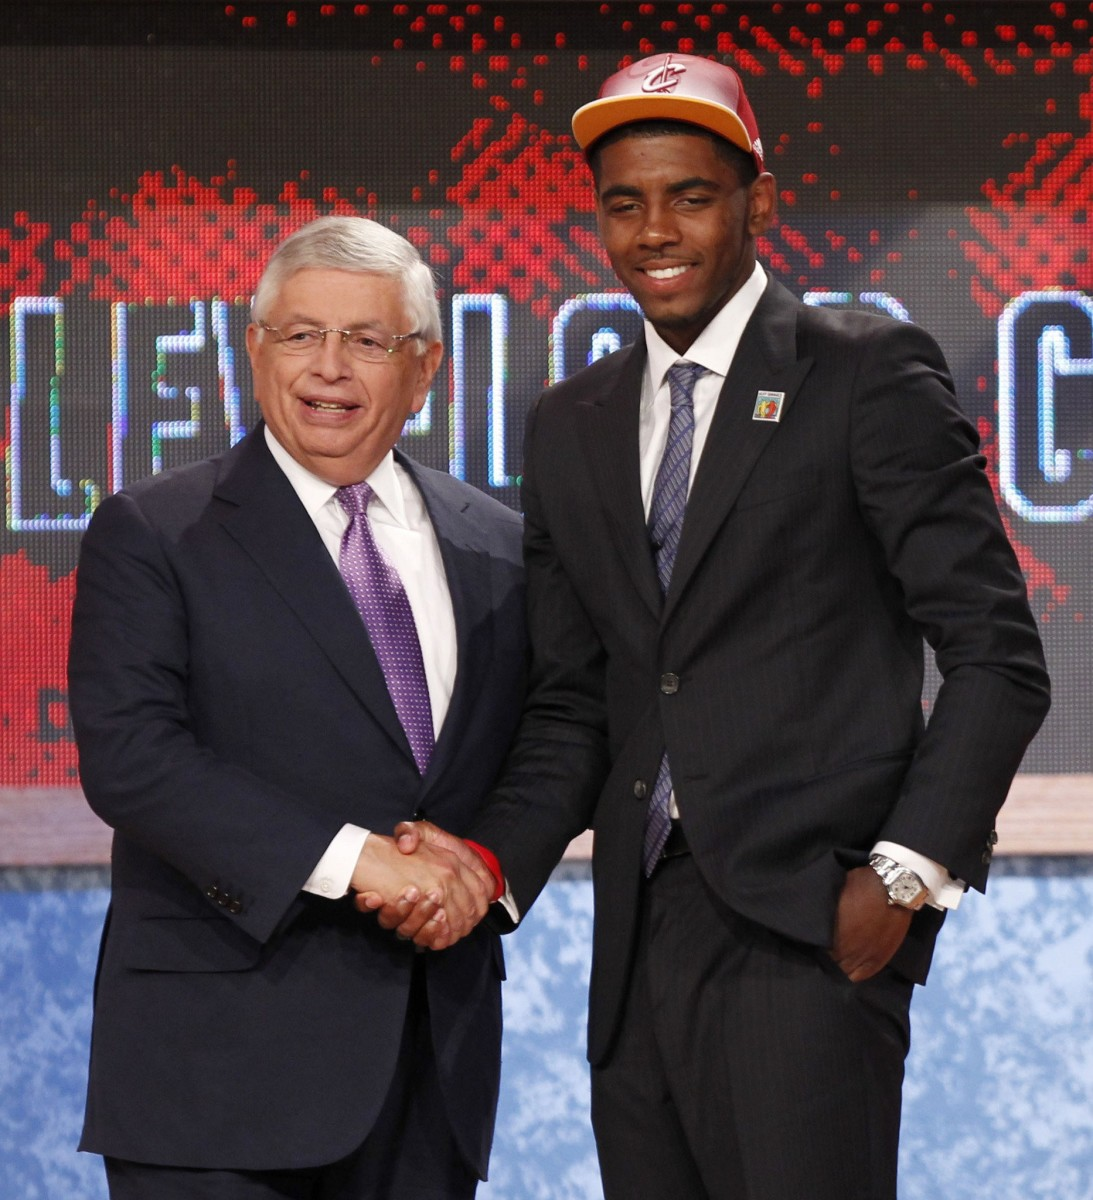 Kyrie Irving - 2011 NBA Draft